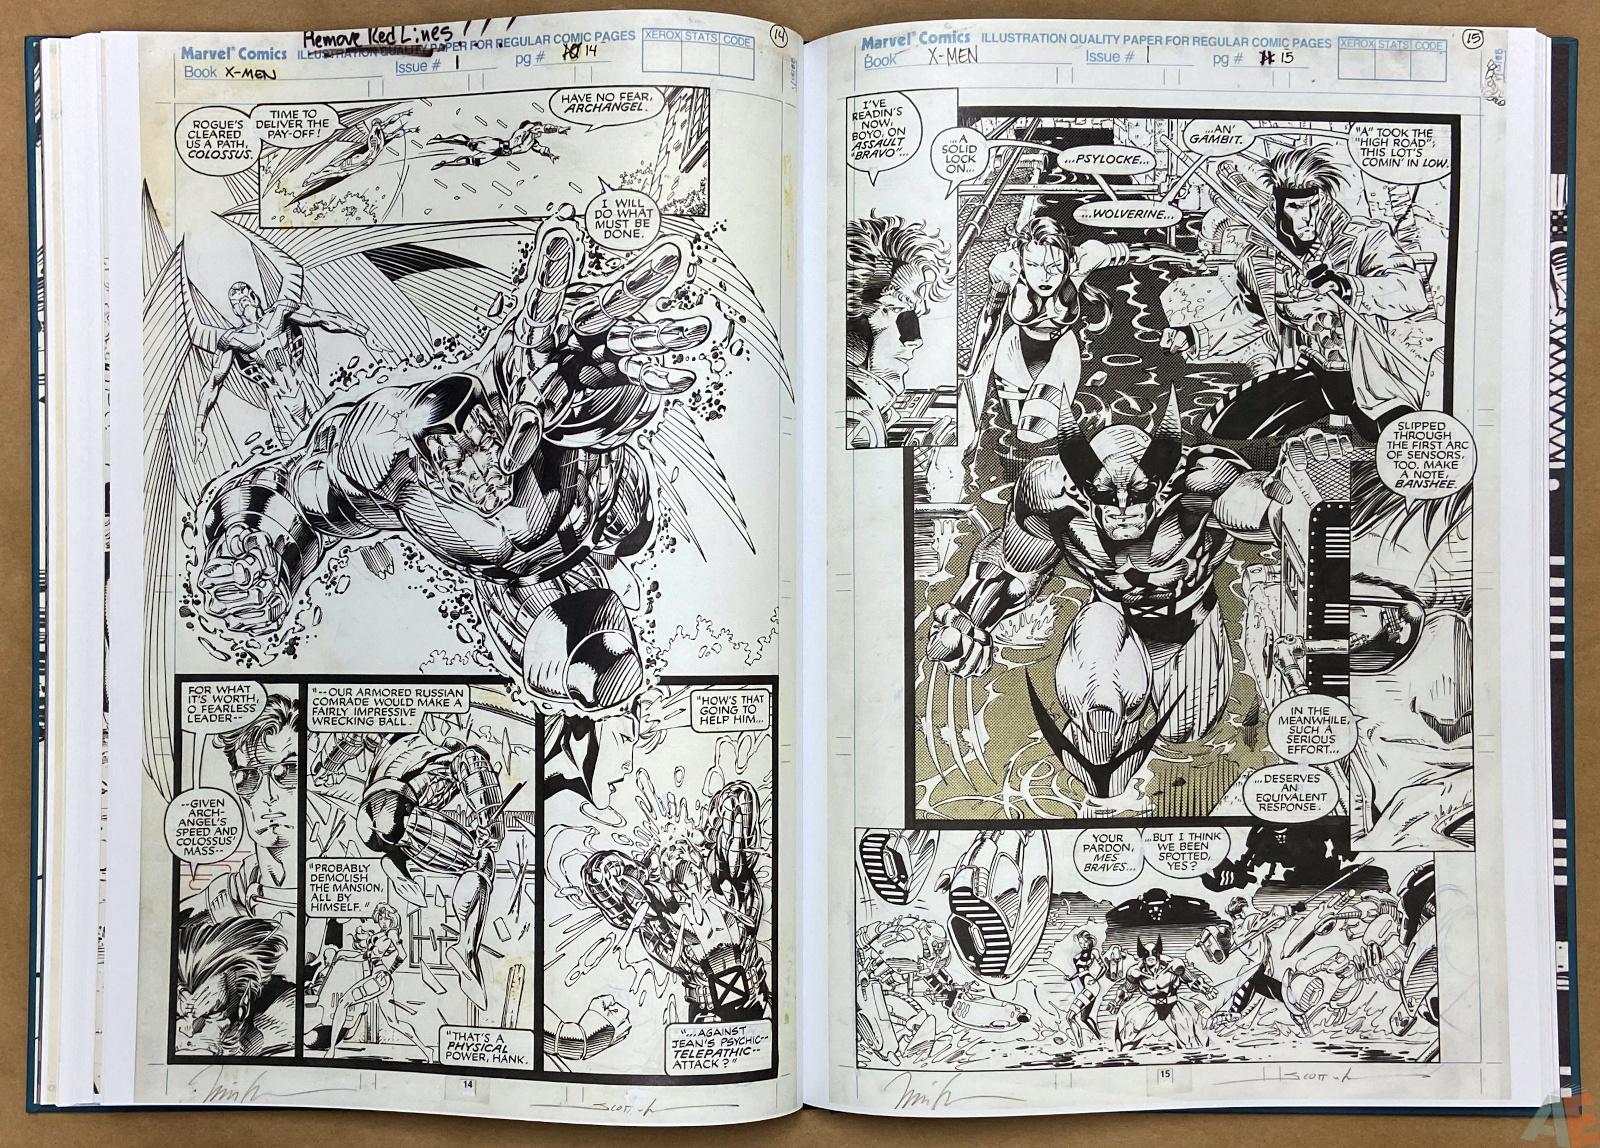 Jim Lees X Men Artists Edition interior 13